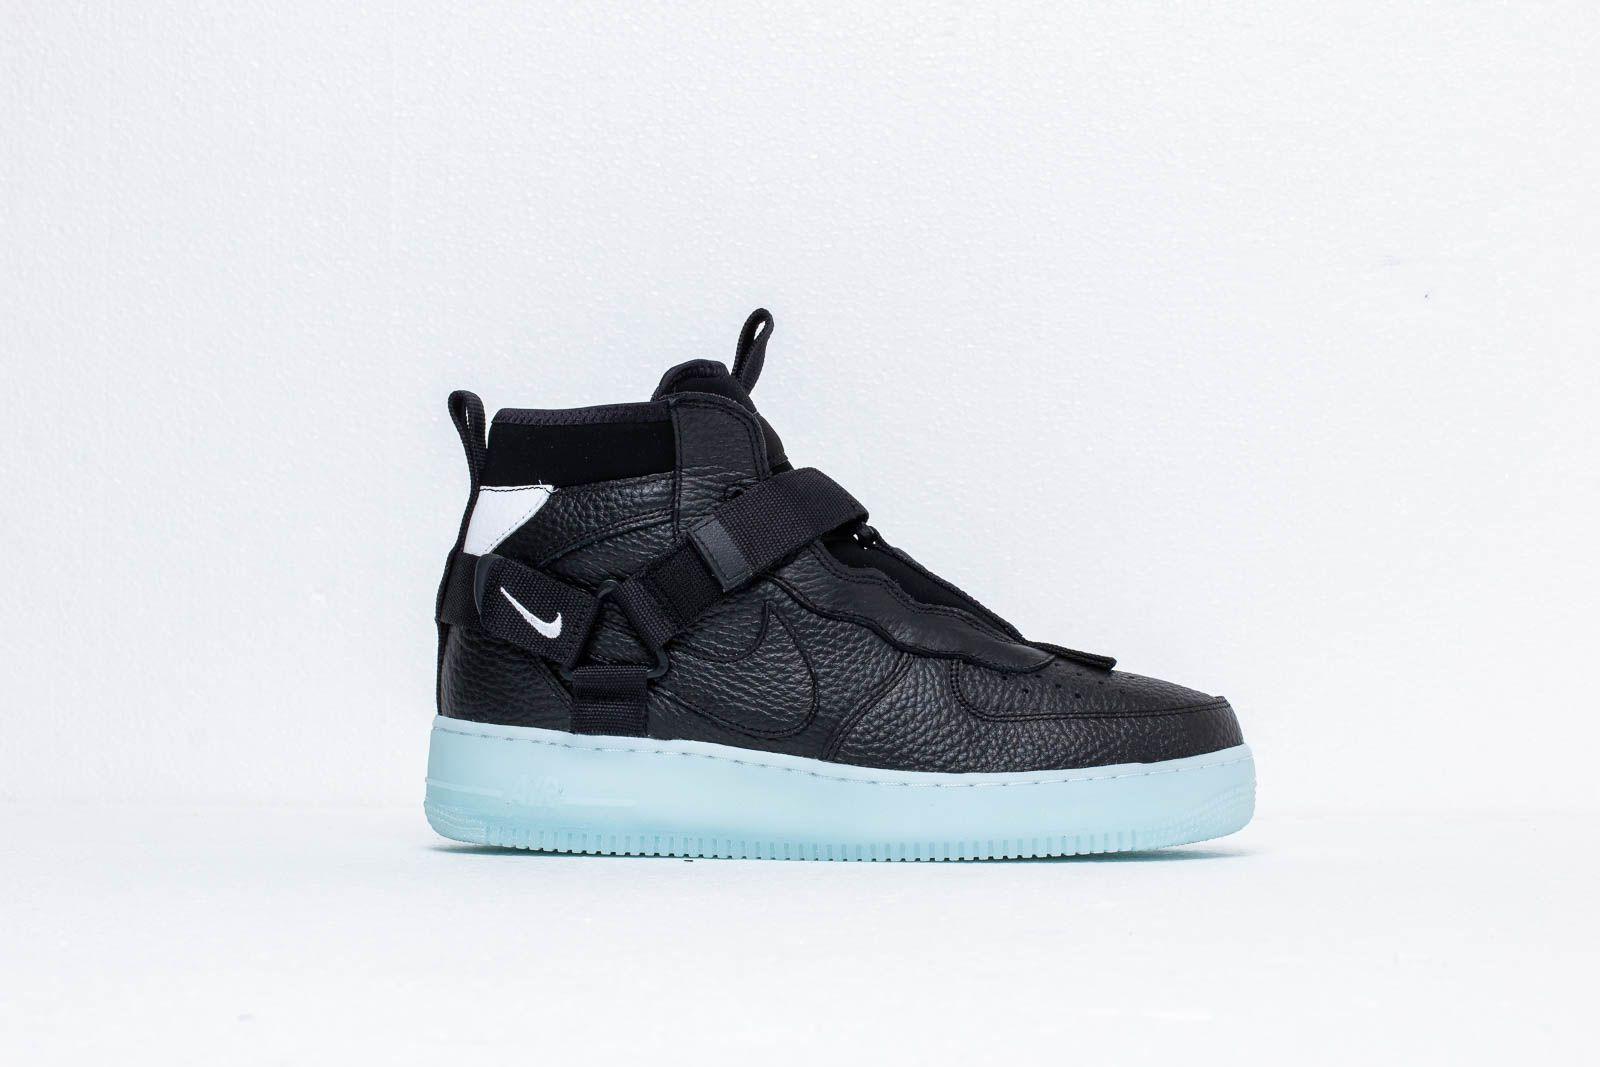 Half Nike WhiteFootshop 1 Blue Air Force Black Utility Mid bY6yfgv7